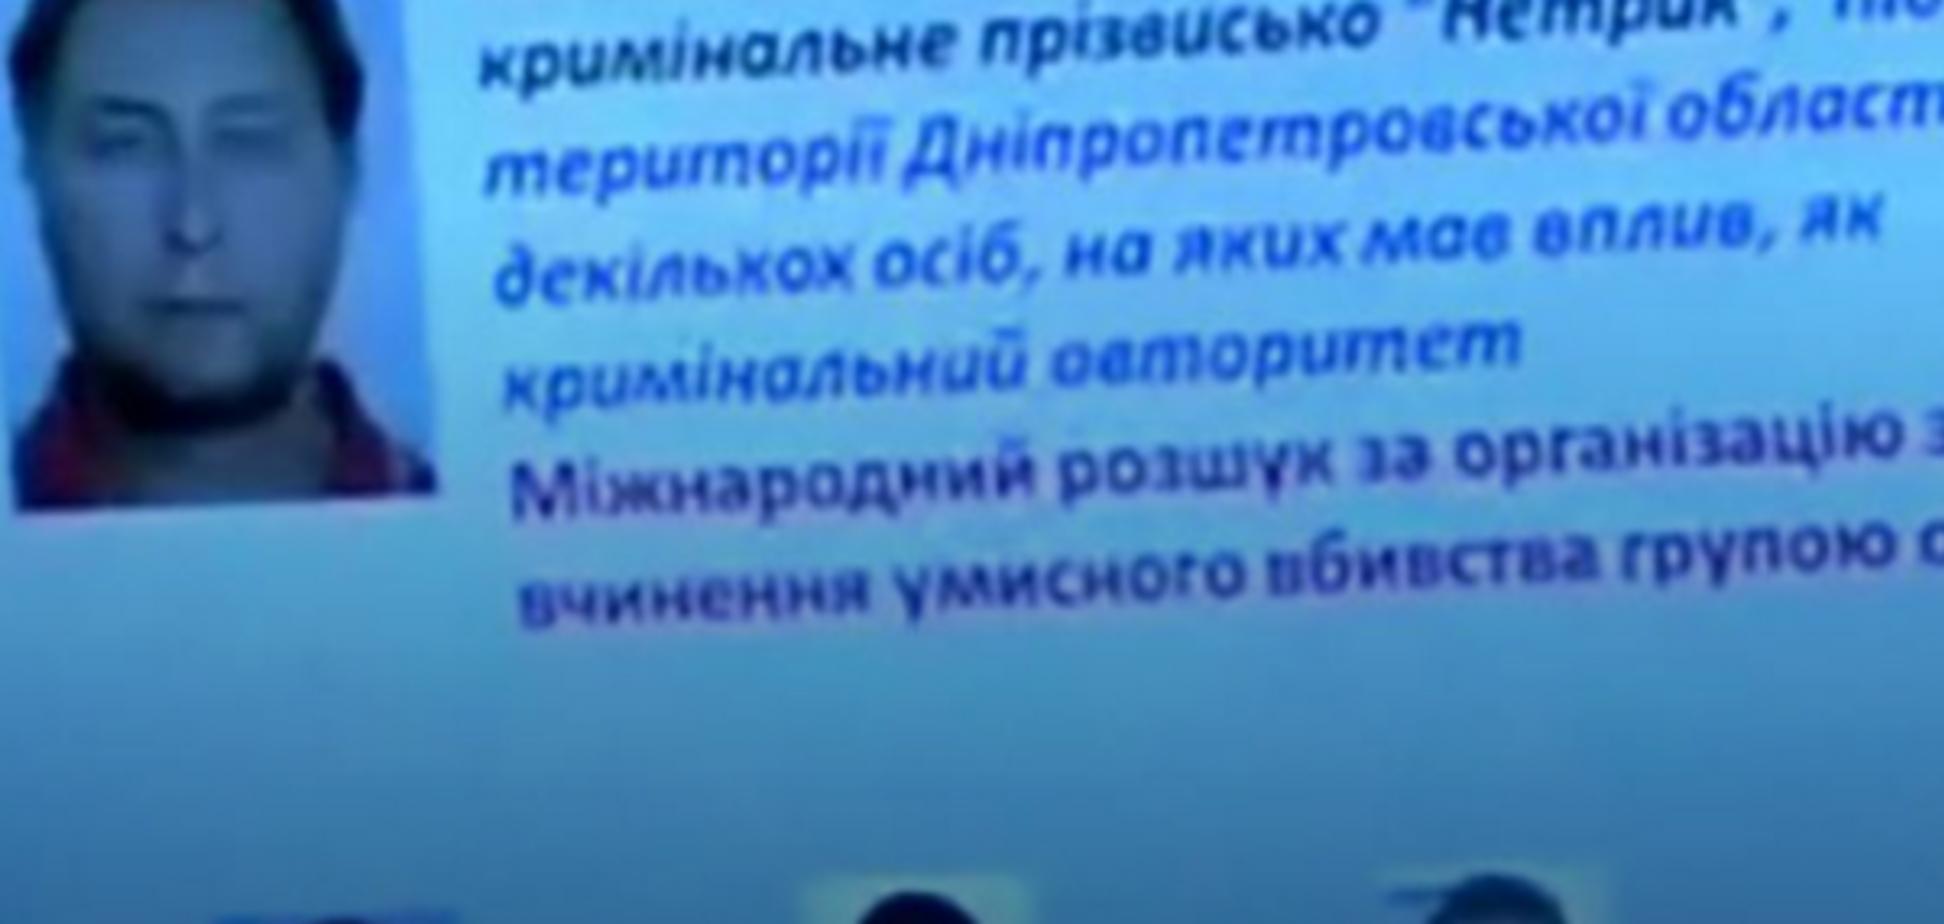 Нардеп: организатора покушения на Чорновол повесили в СИЗО